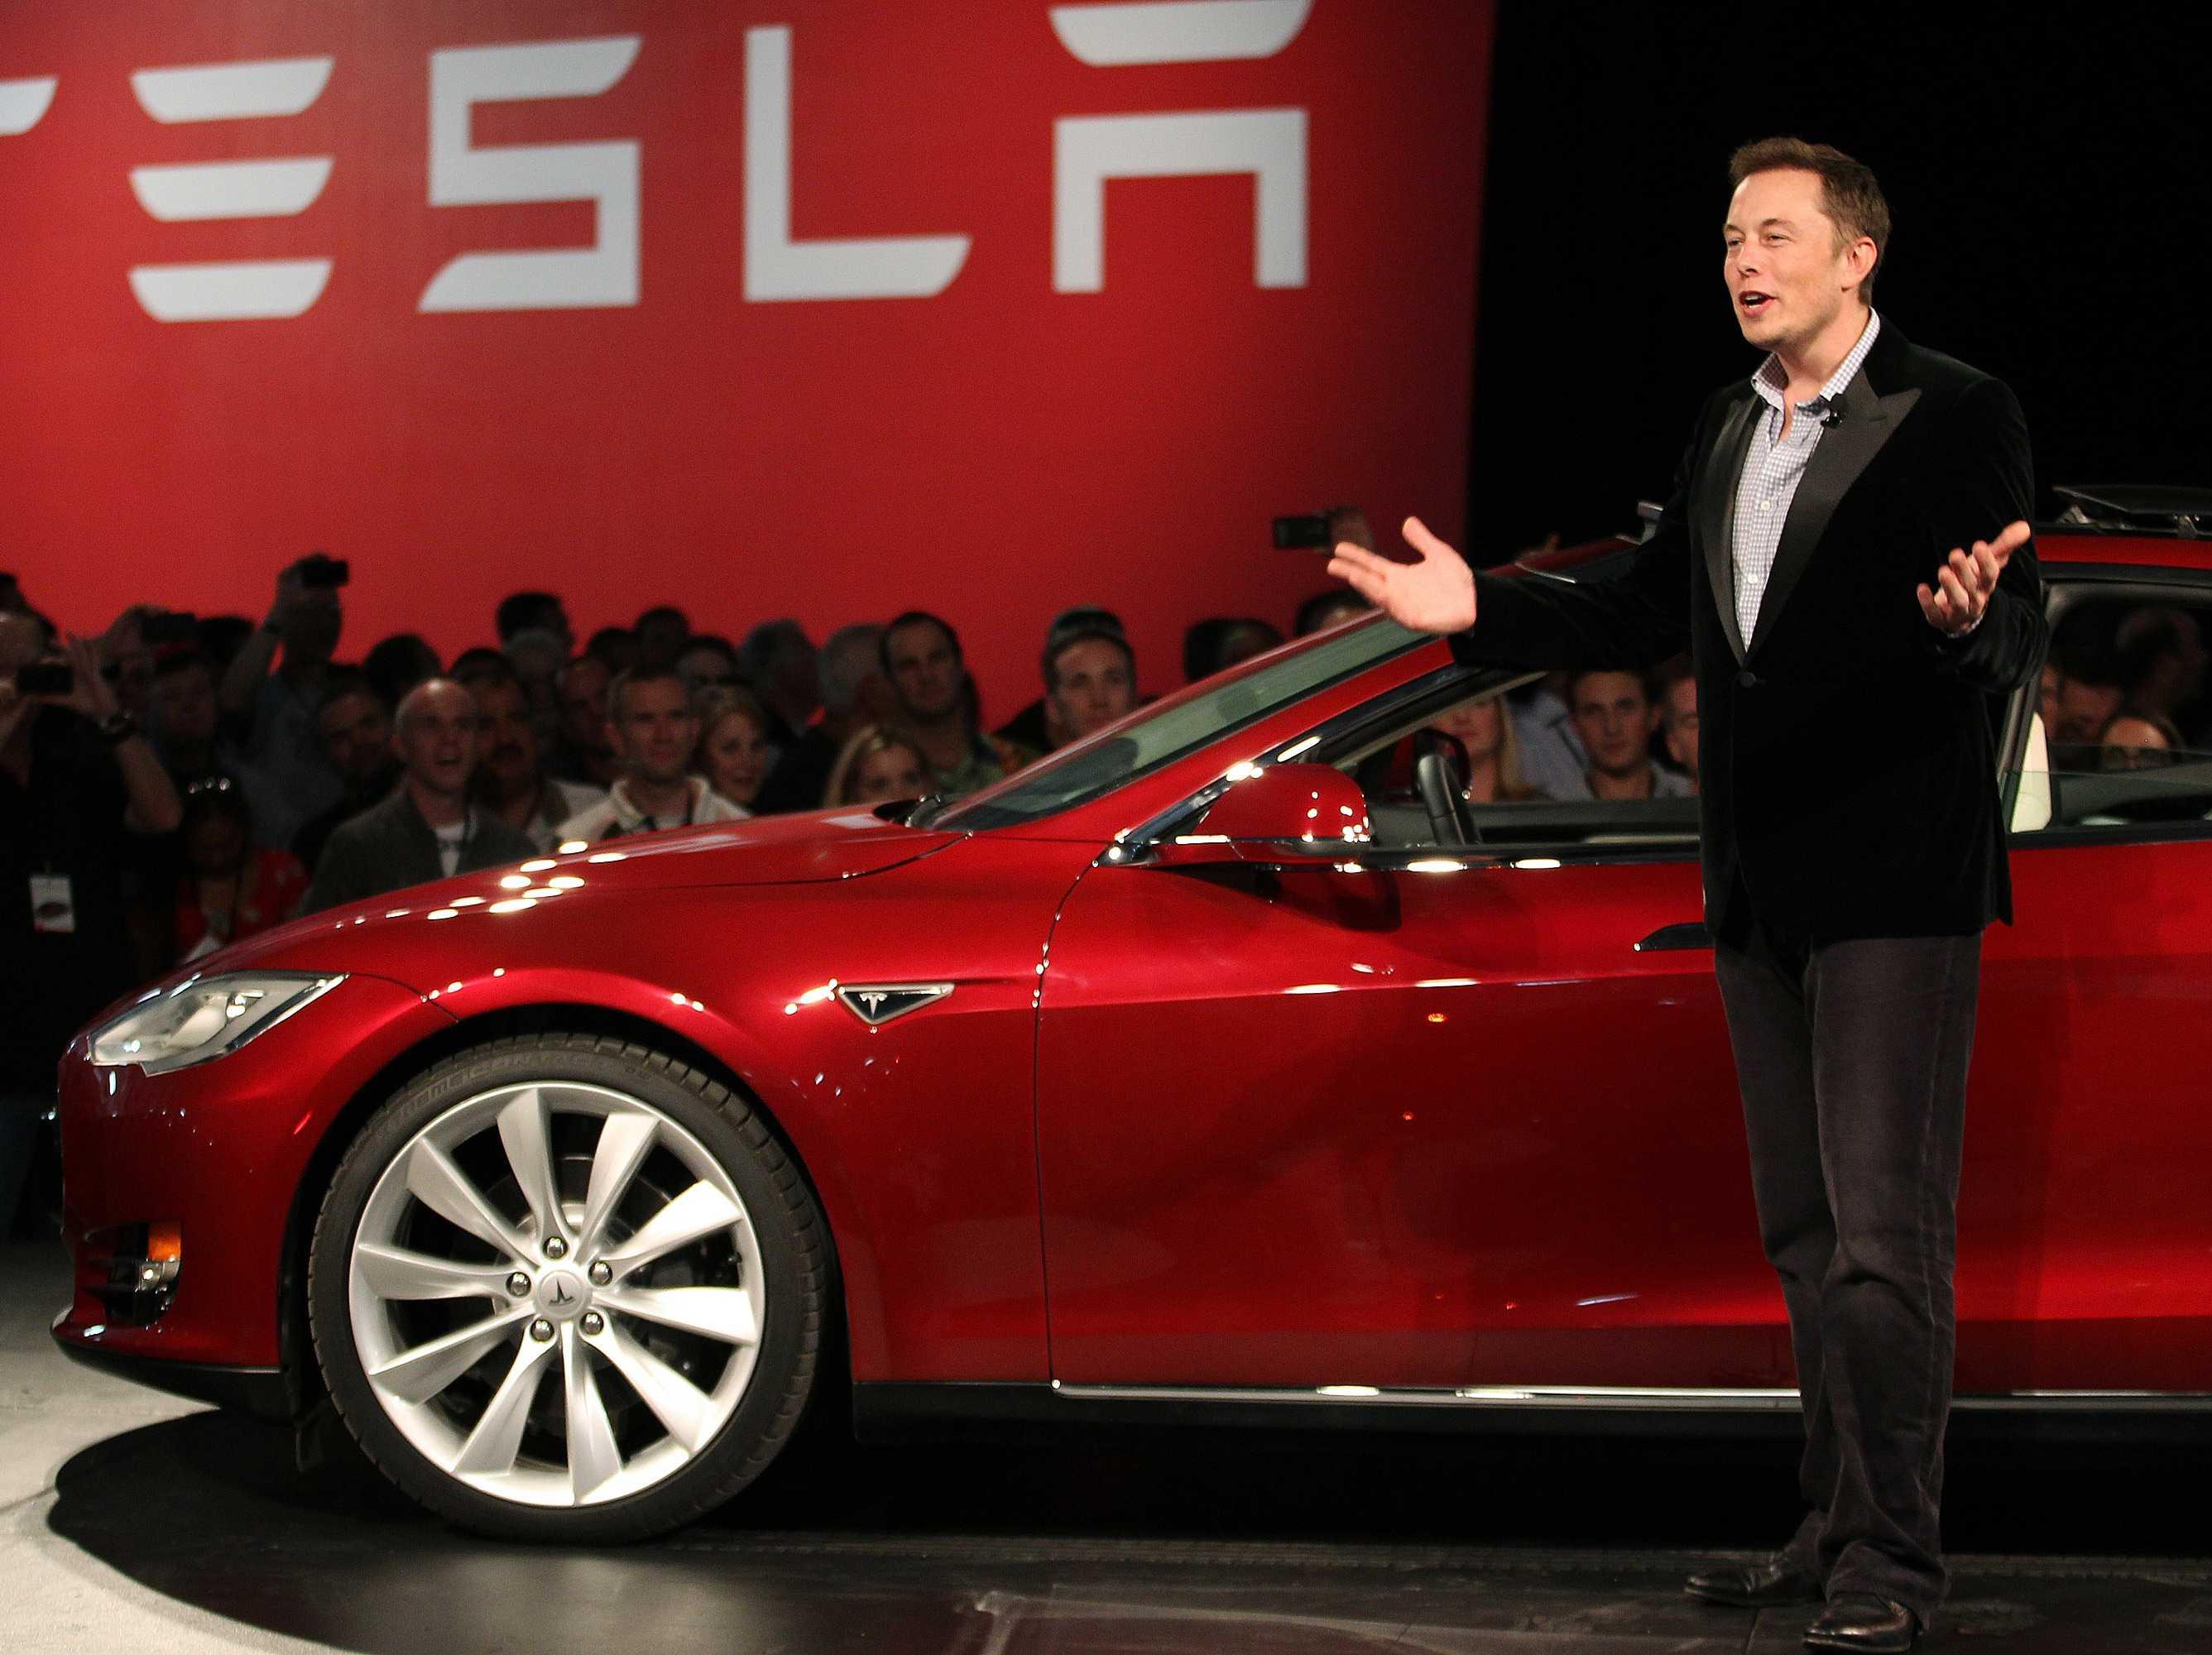 Tesla HD Wallpapers Hd Wallpapers 2673x2000